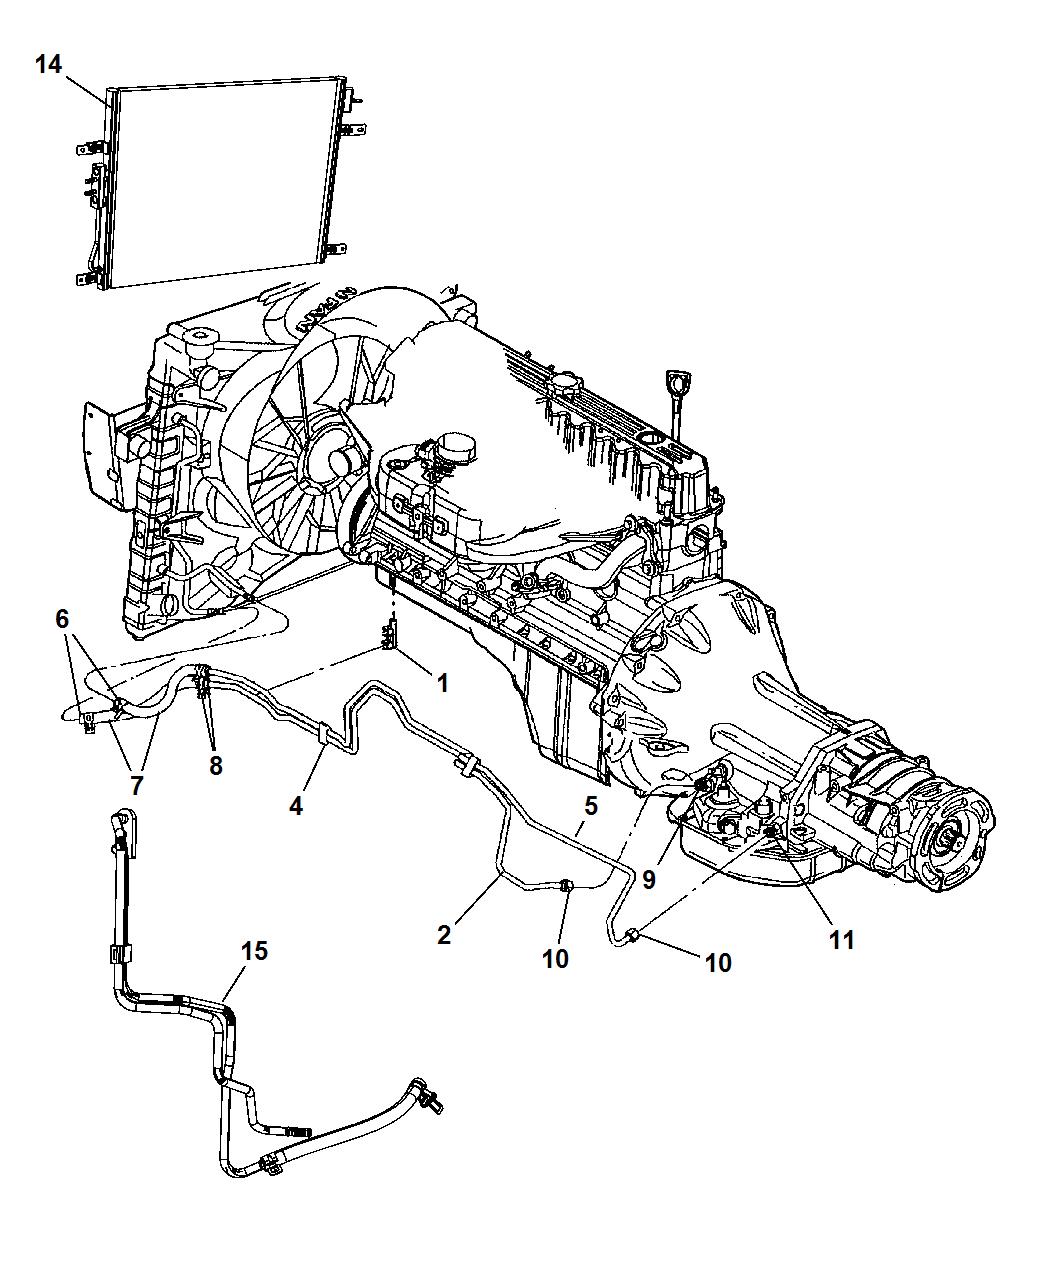 DH_2631] 2004 Jeep Grand Cherokee Parts Diagram ImagesInoma Targ Ommit Cajos Phae Mohammedshrine Librar Wiring 101